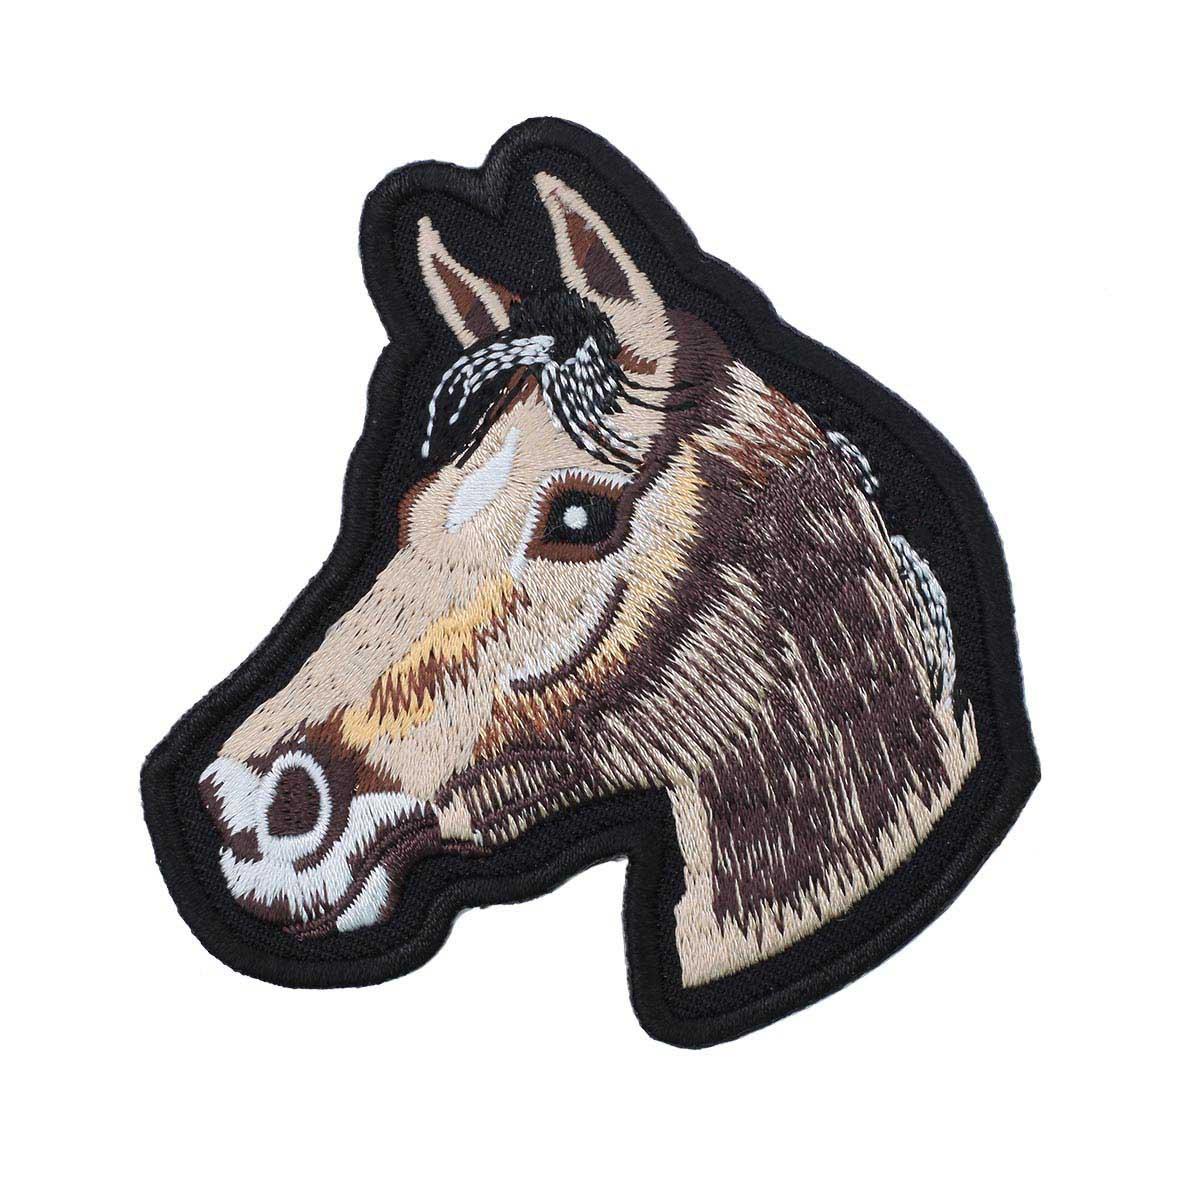 Термоаппликация 'Лошадь' 7,7*8см Hobby&Pro